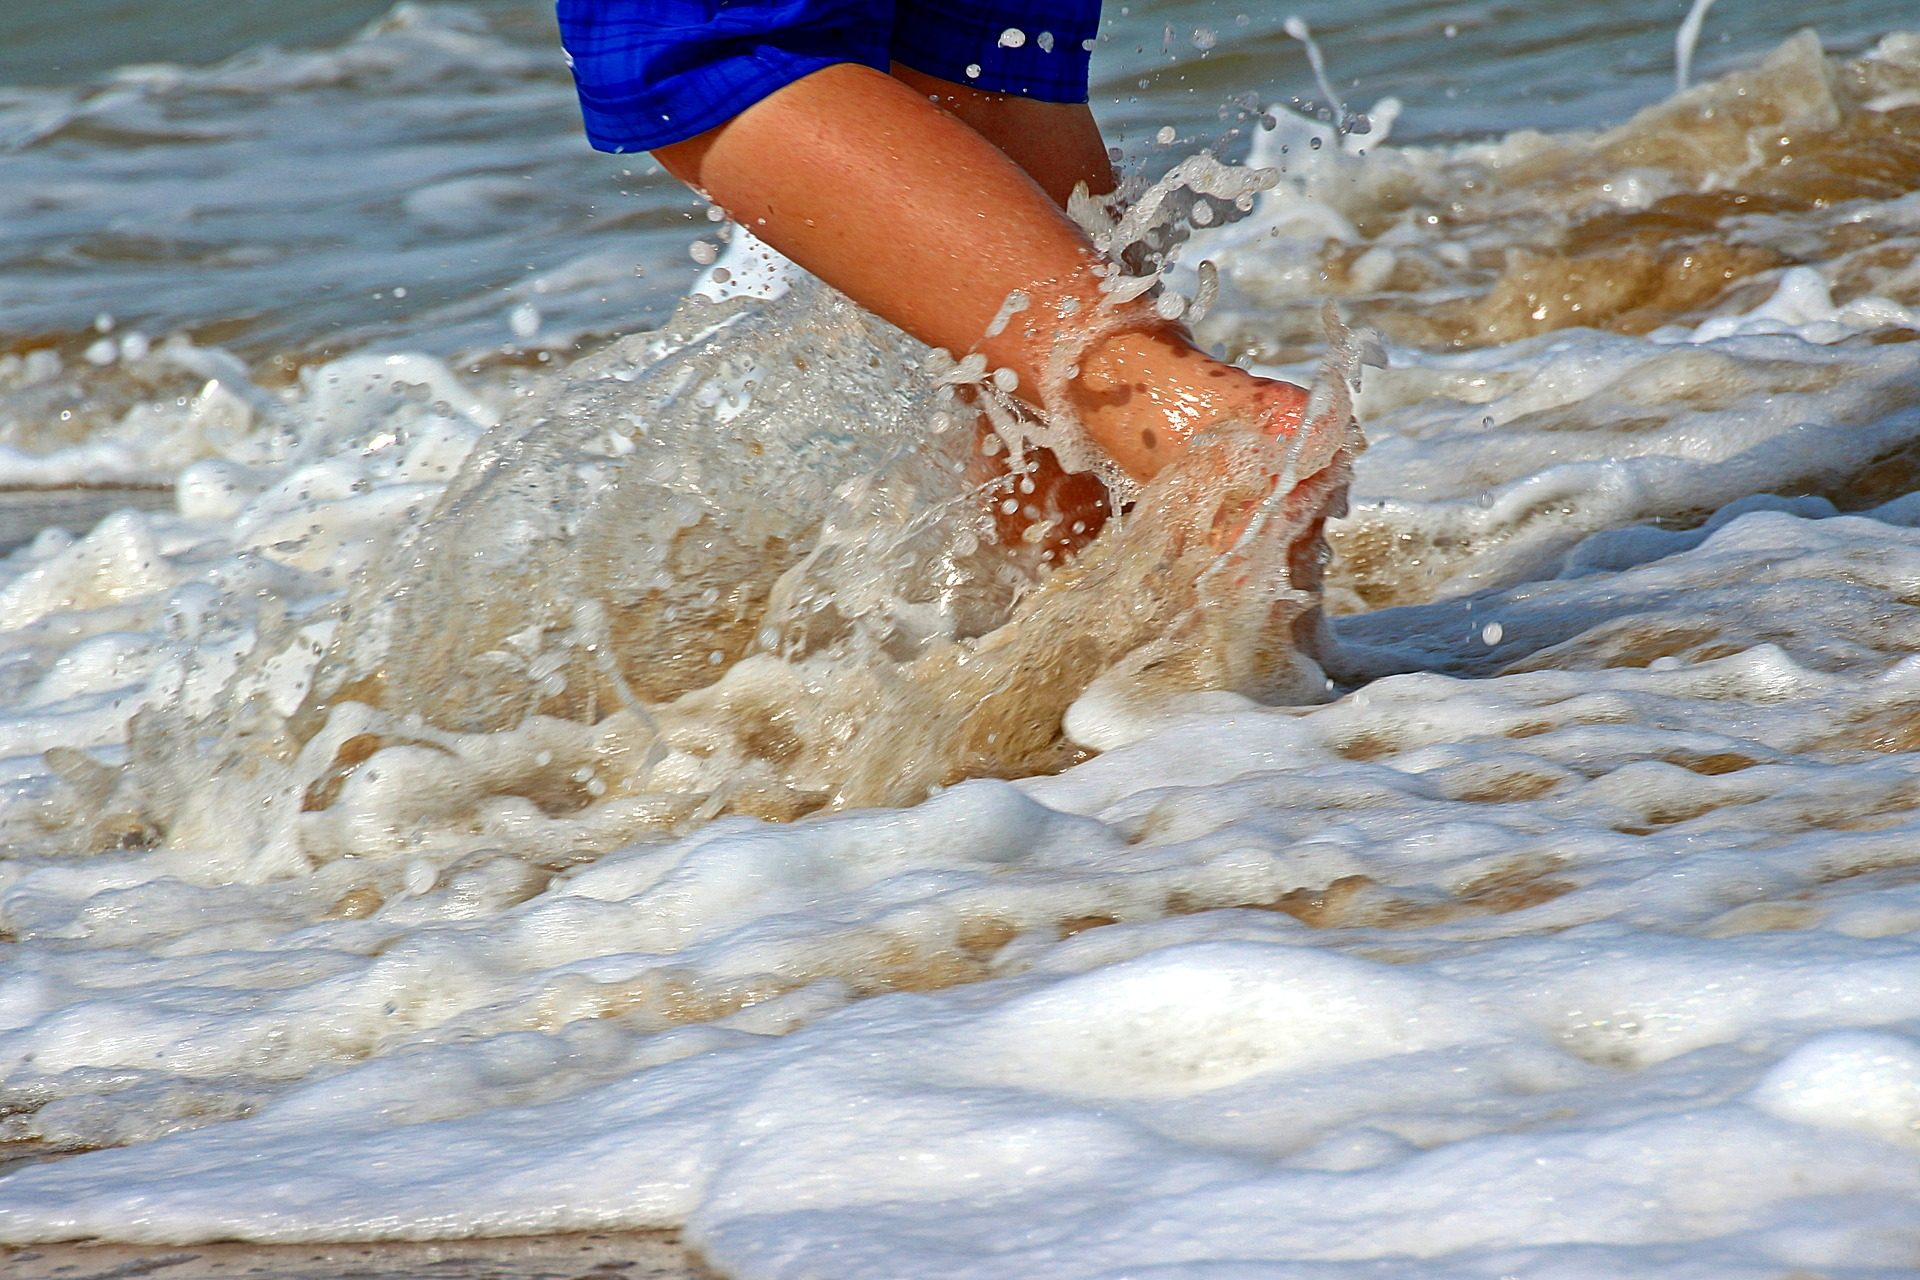 Wasser, Wellen, Ufer, Strand, Beine, Schaum - Wallpaper HD - Prof.-falken.com